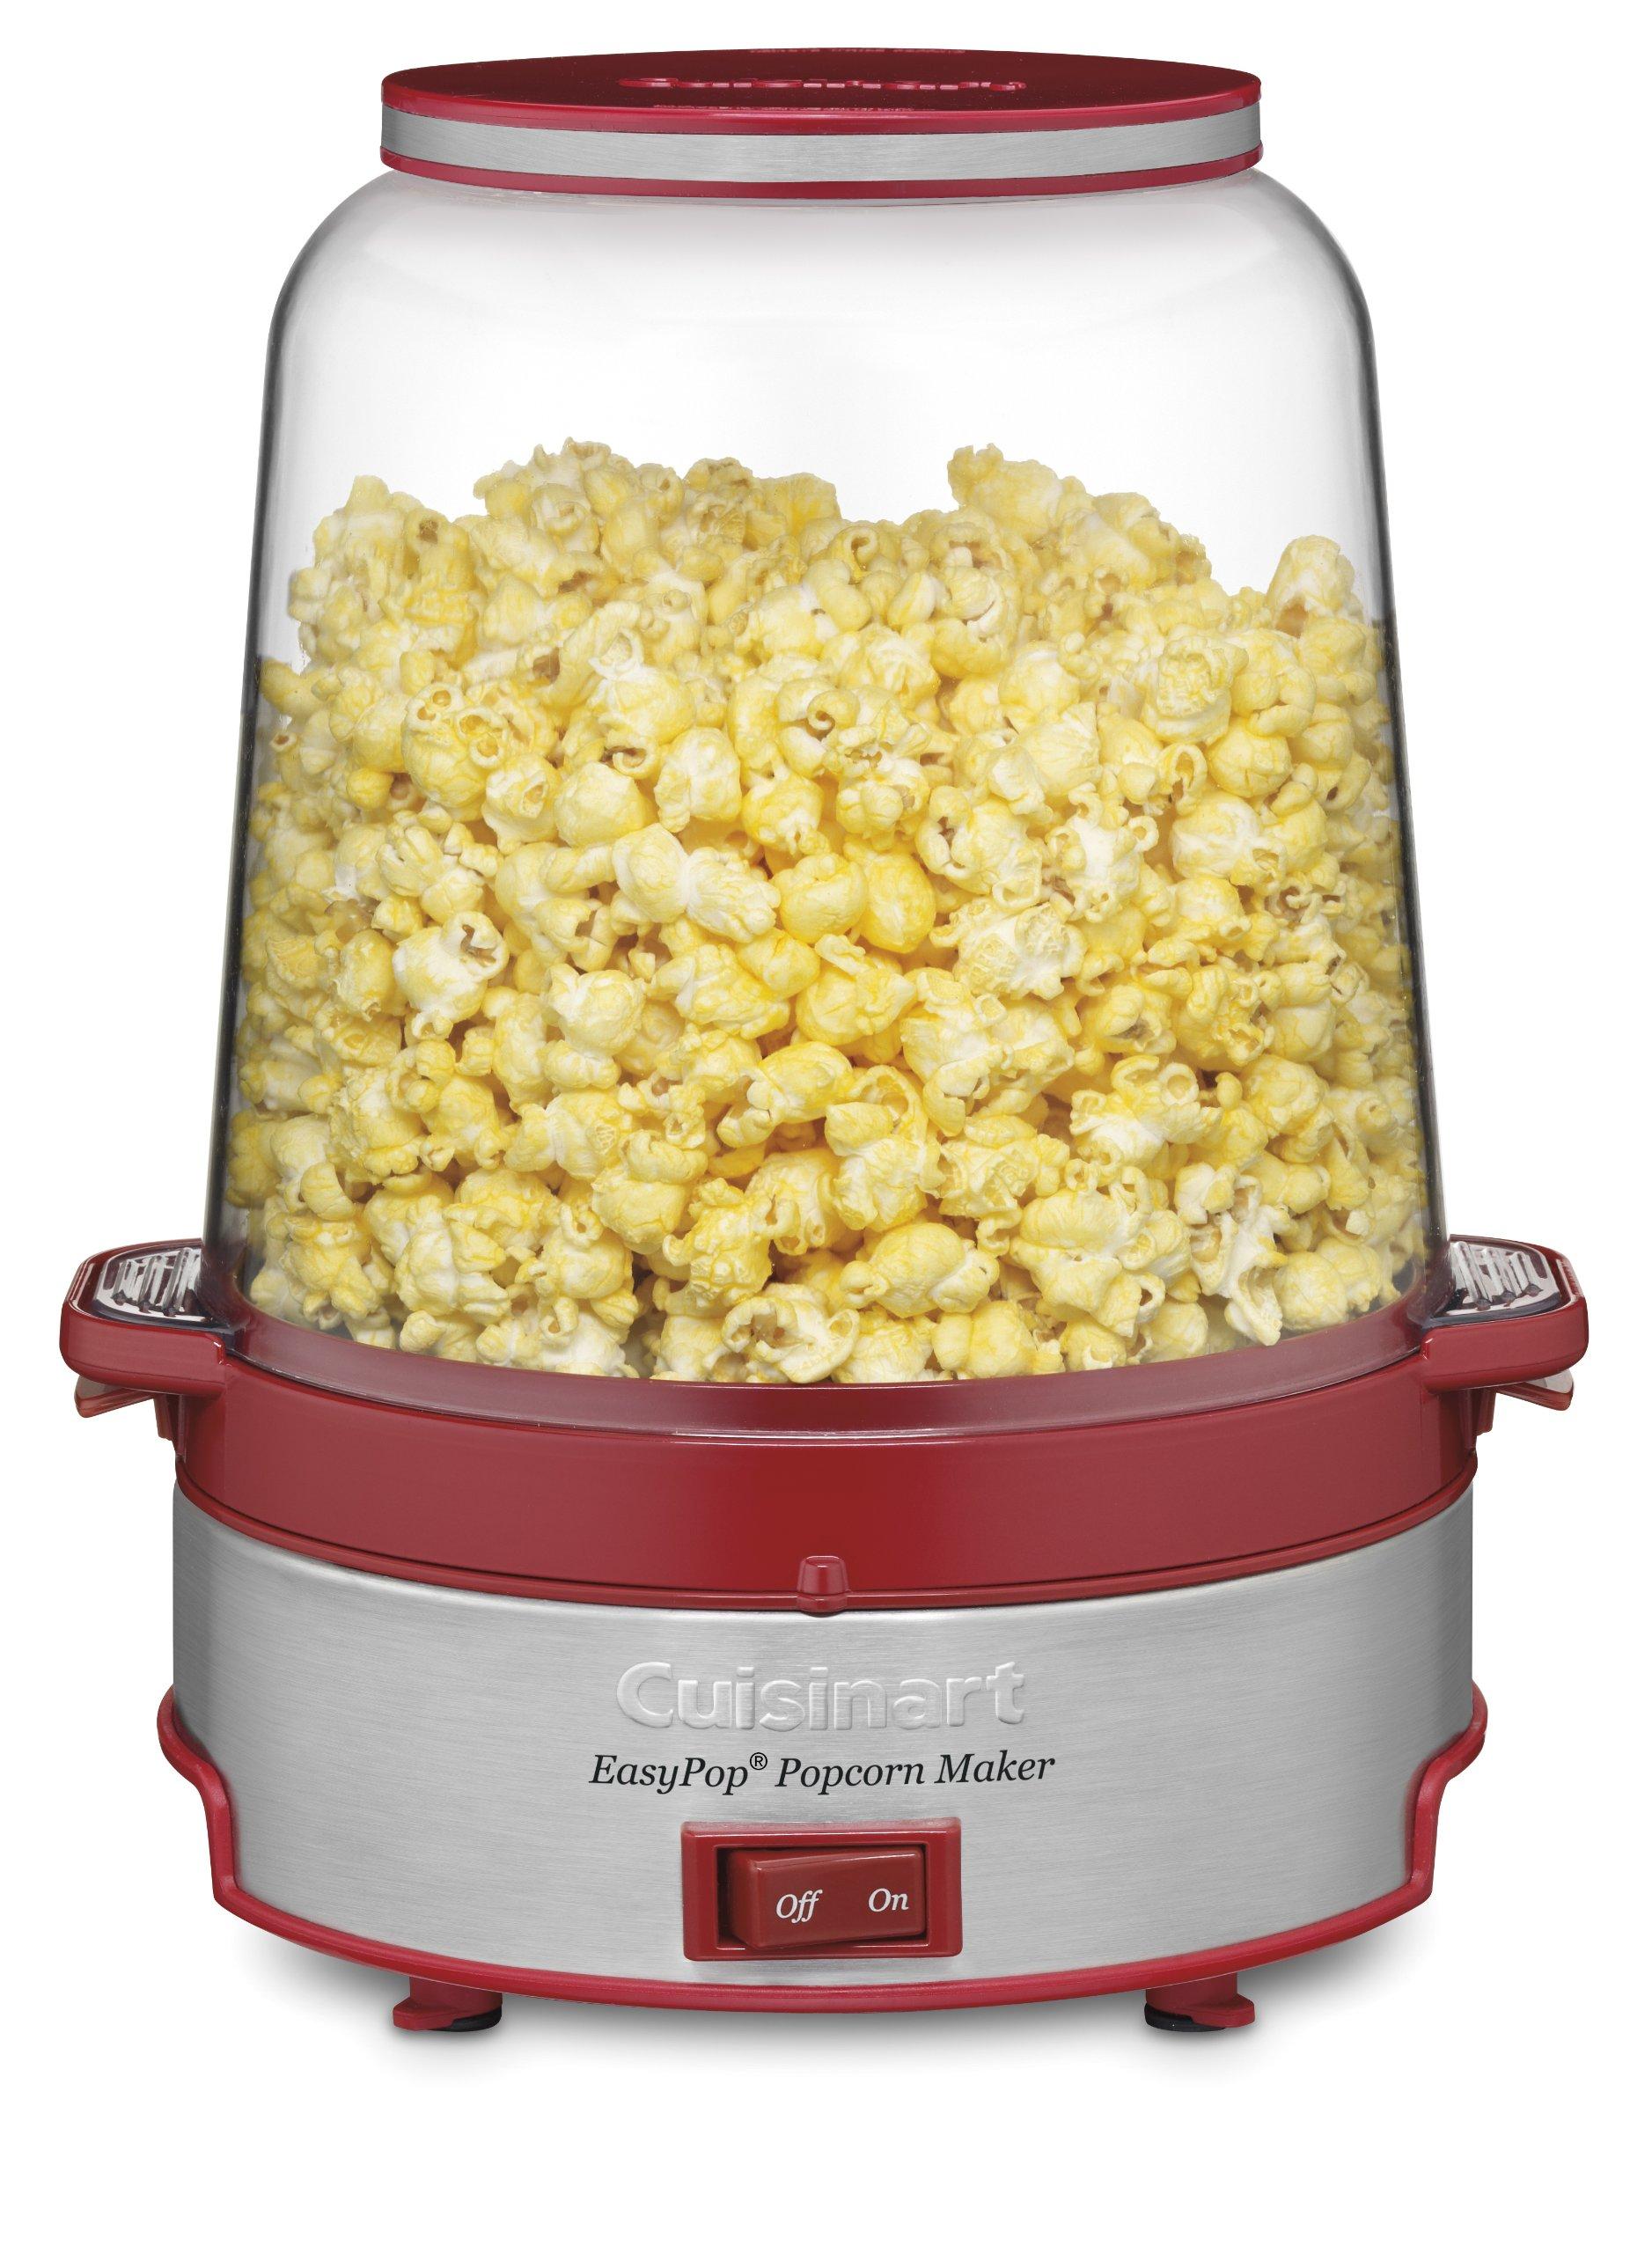 Cuisinart CPM-700 EasyPop Popcorn Maker, Red by Cuisinart (Image #1)